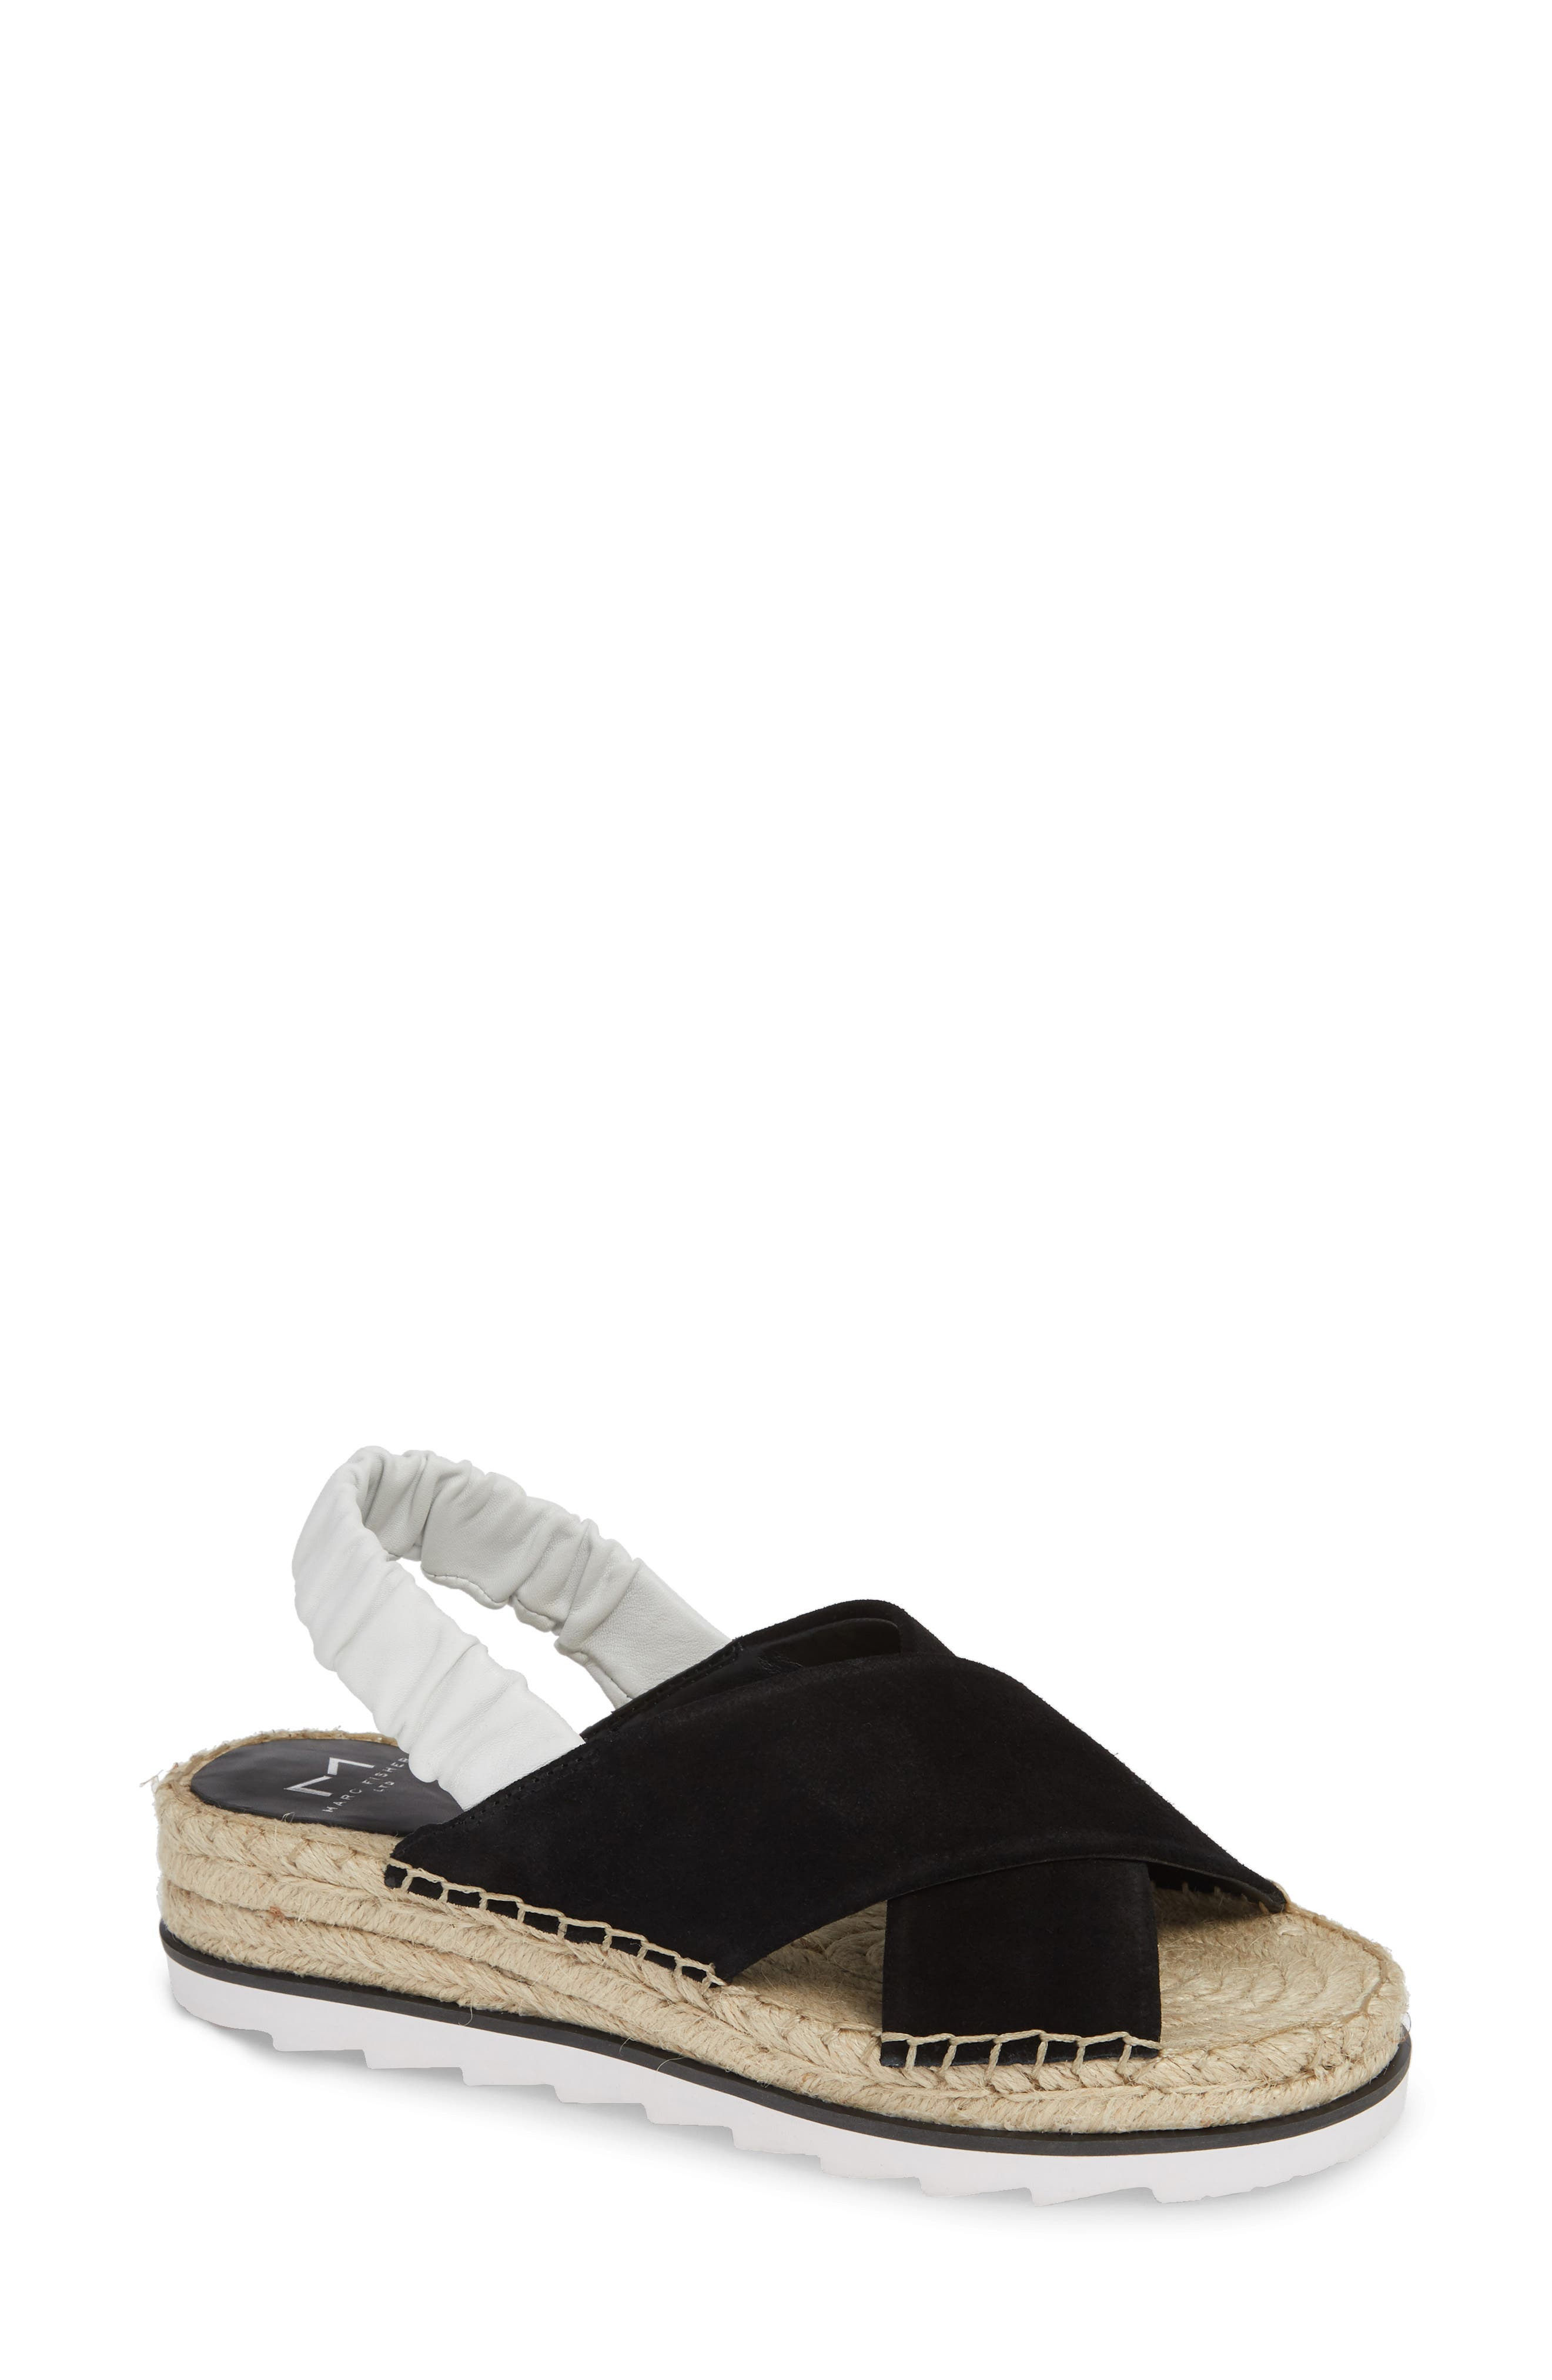 MARC FISHER LTD Pella Sandal, Main, color, BLACK SUEDE